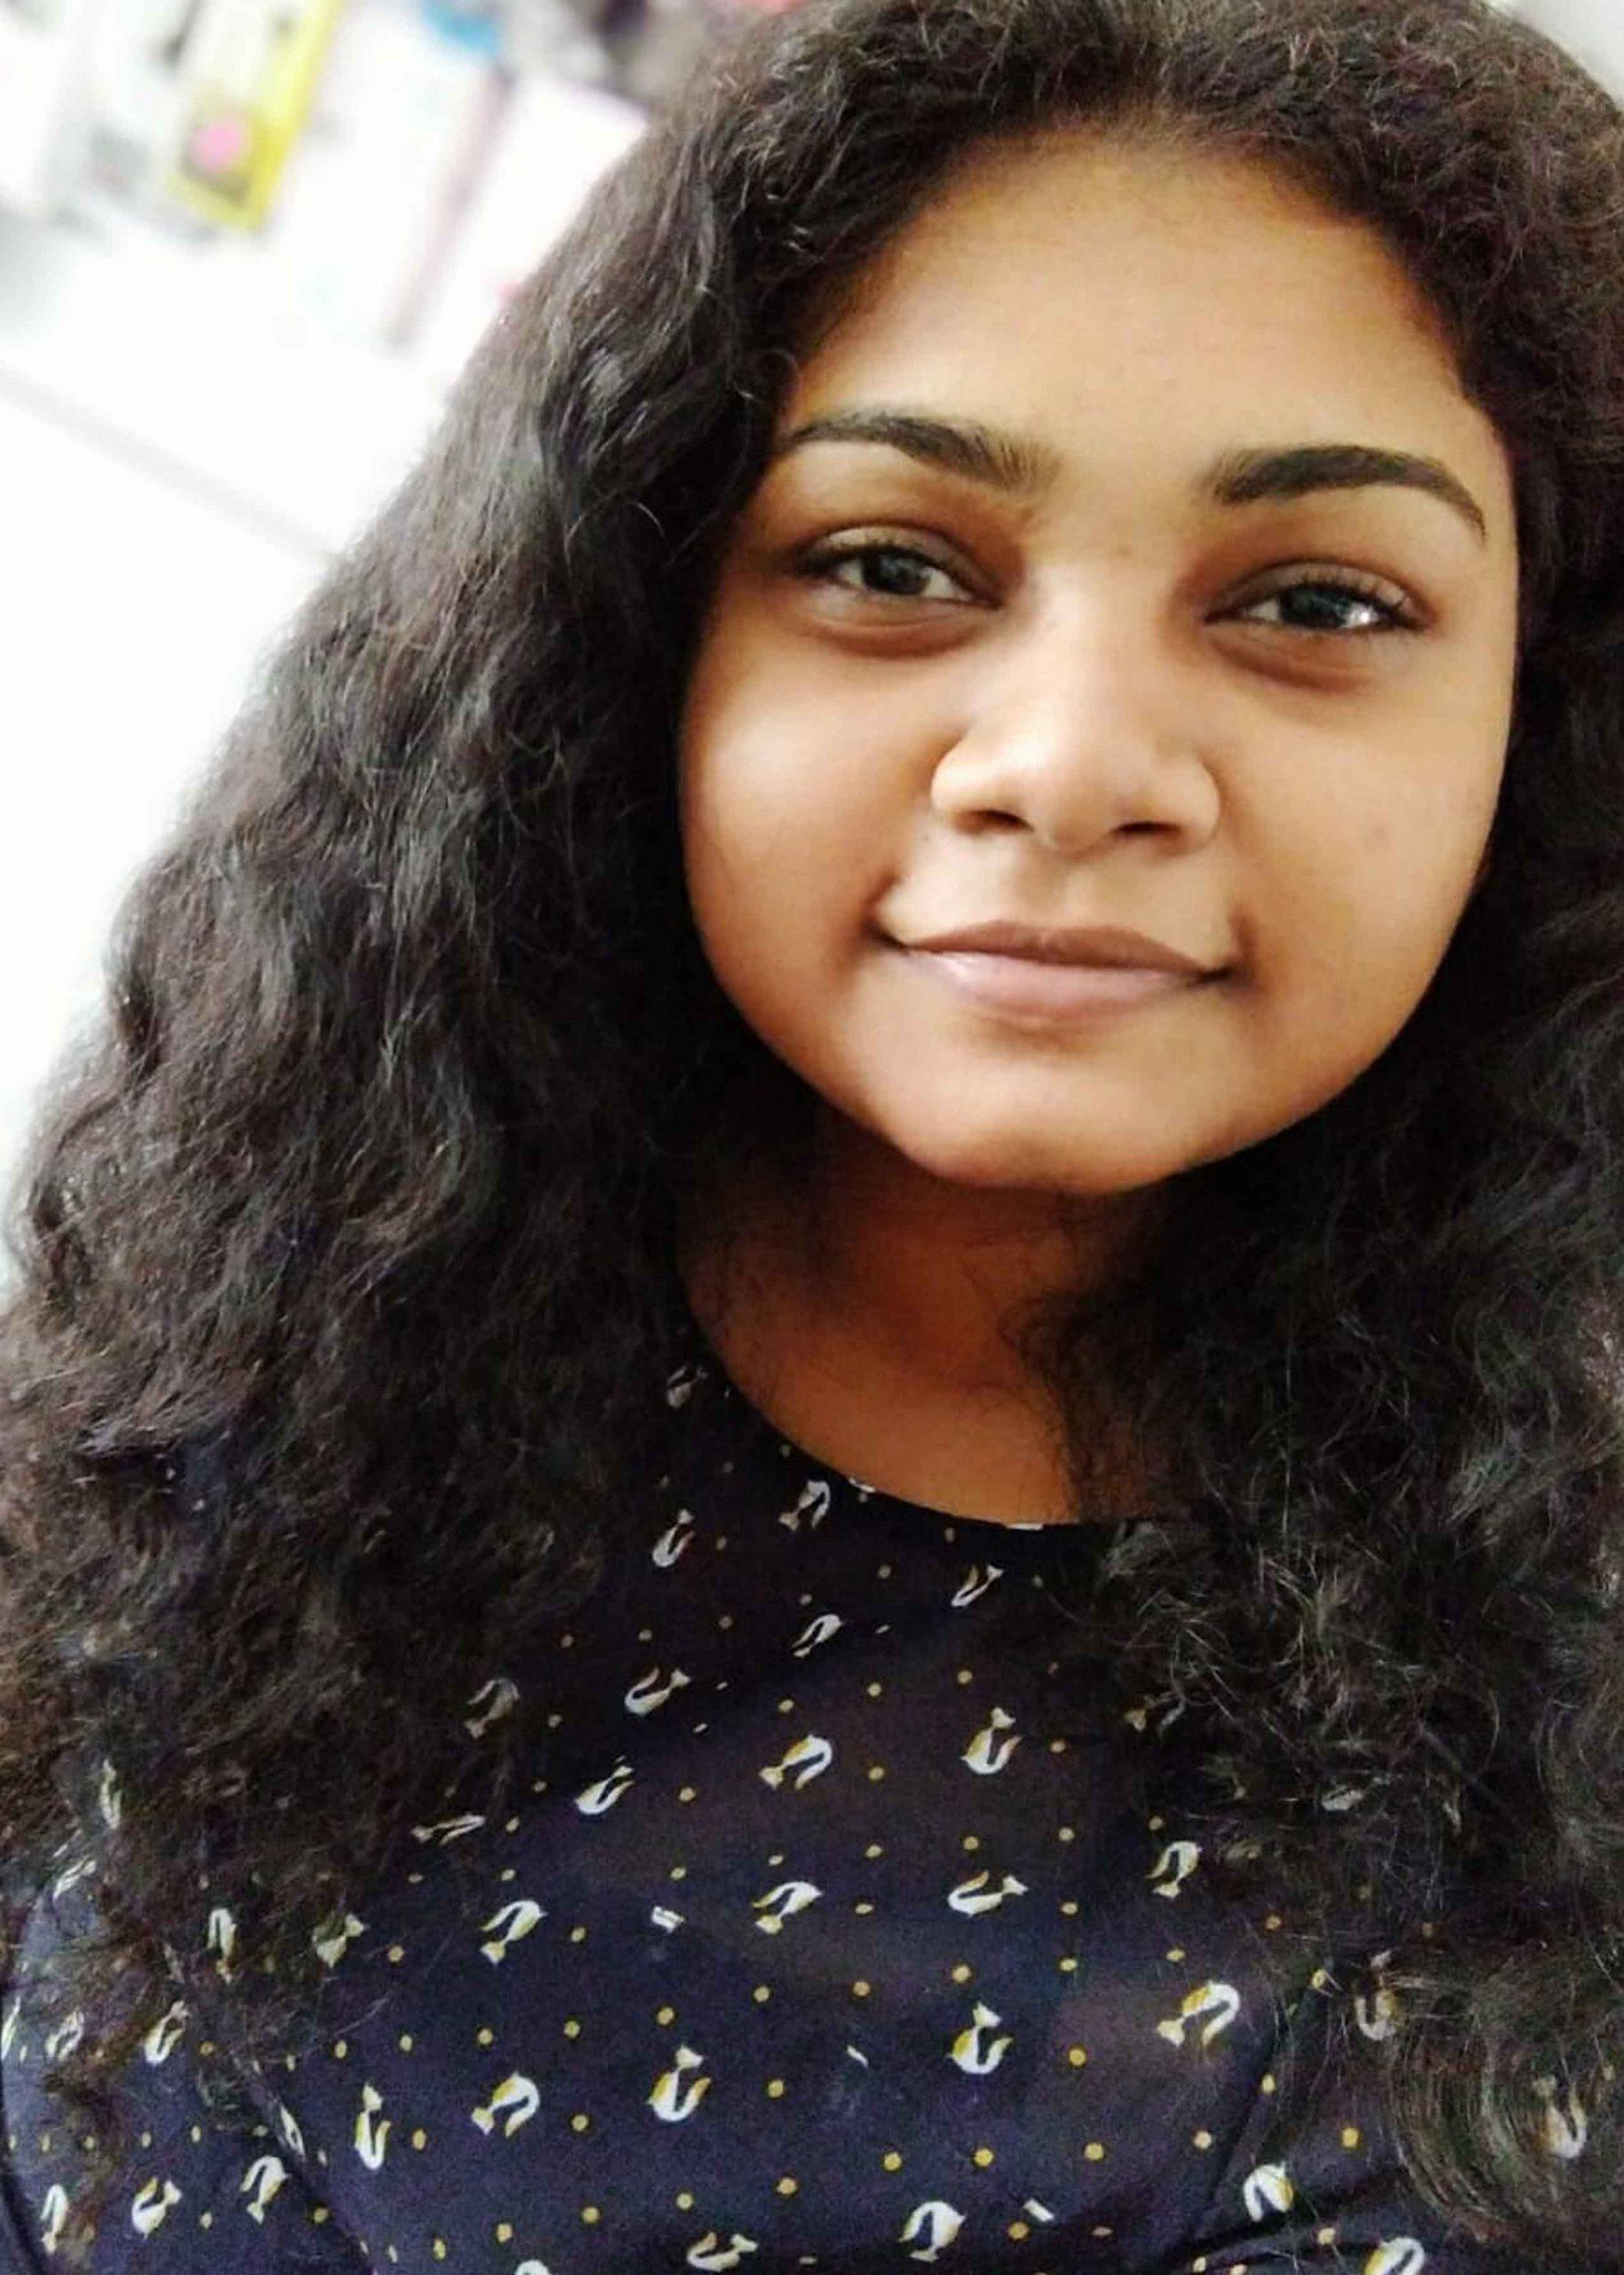 Adithya Buddini